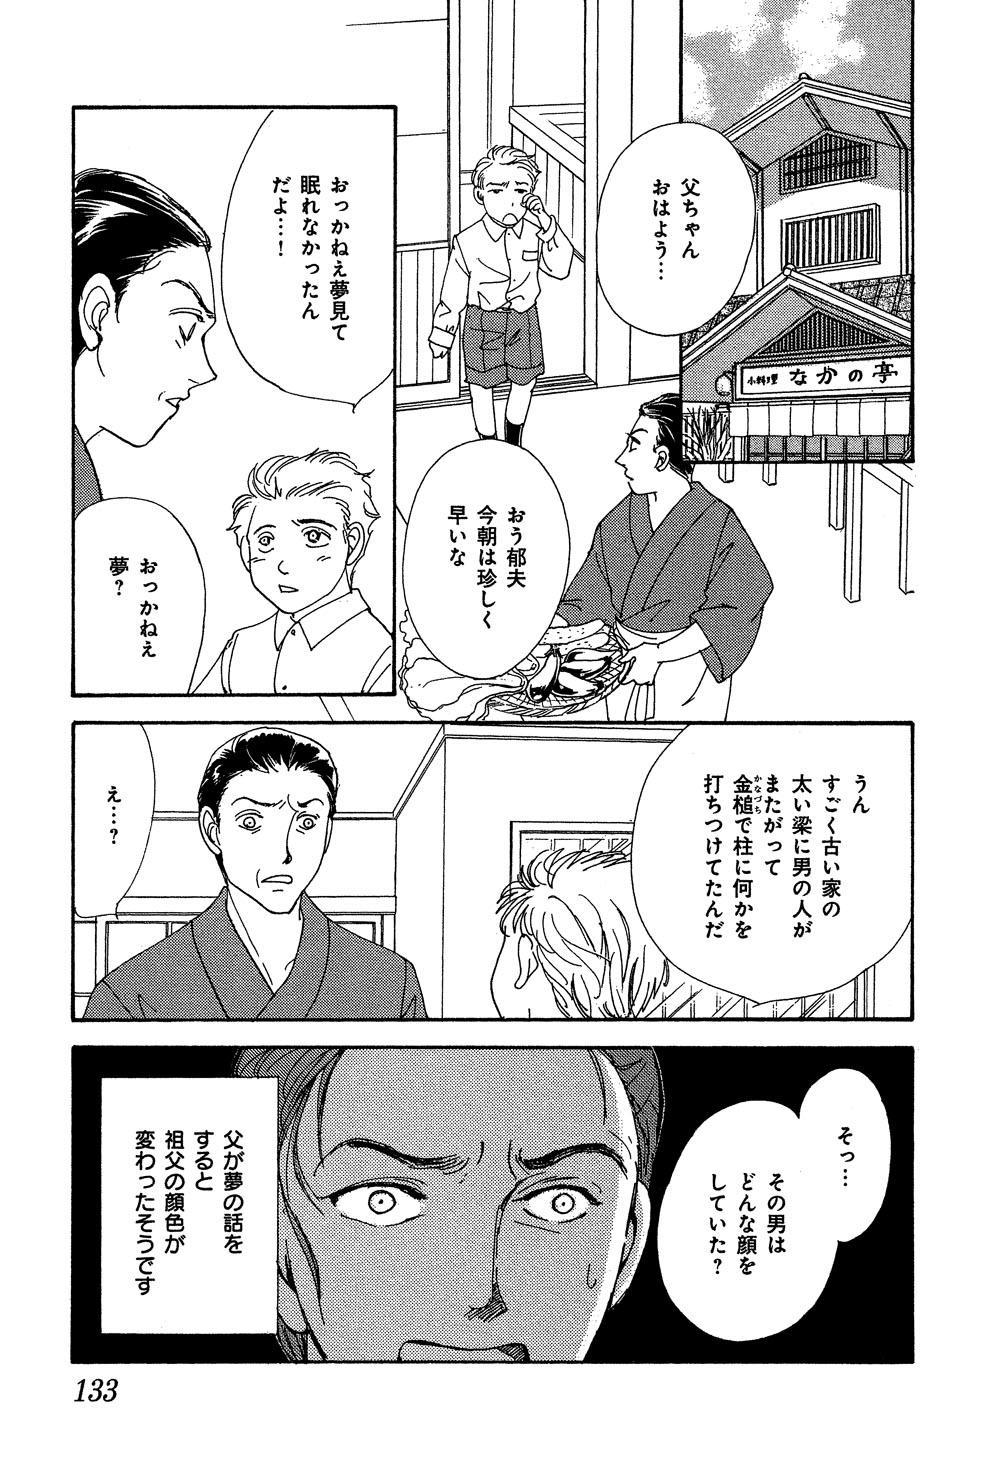 mayuri_0001_0133.jpg